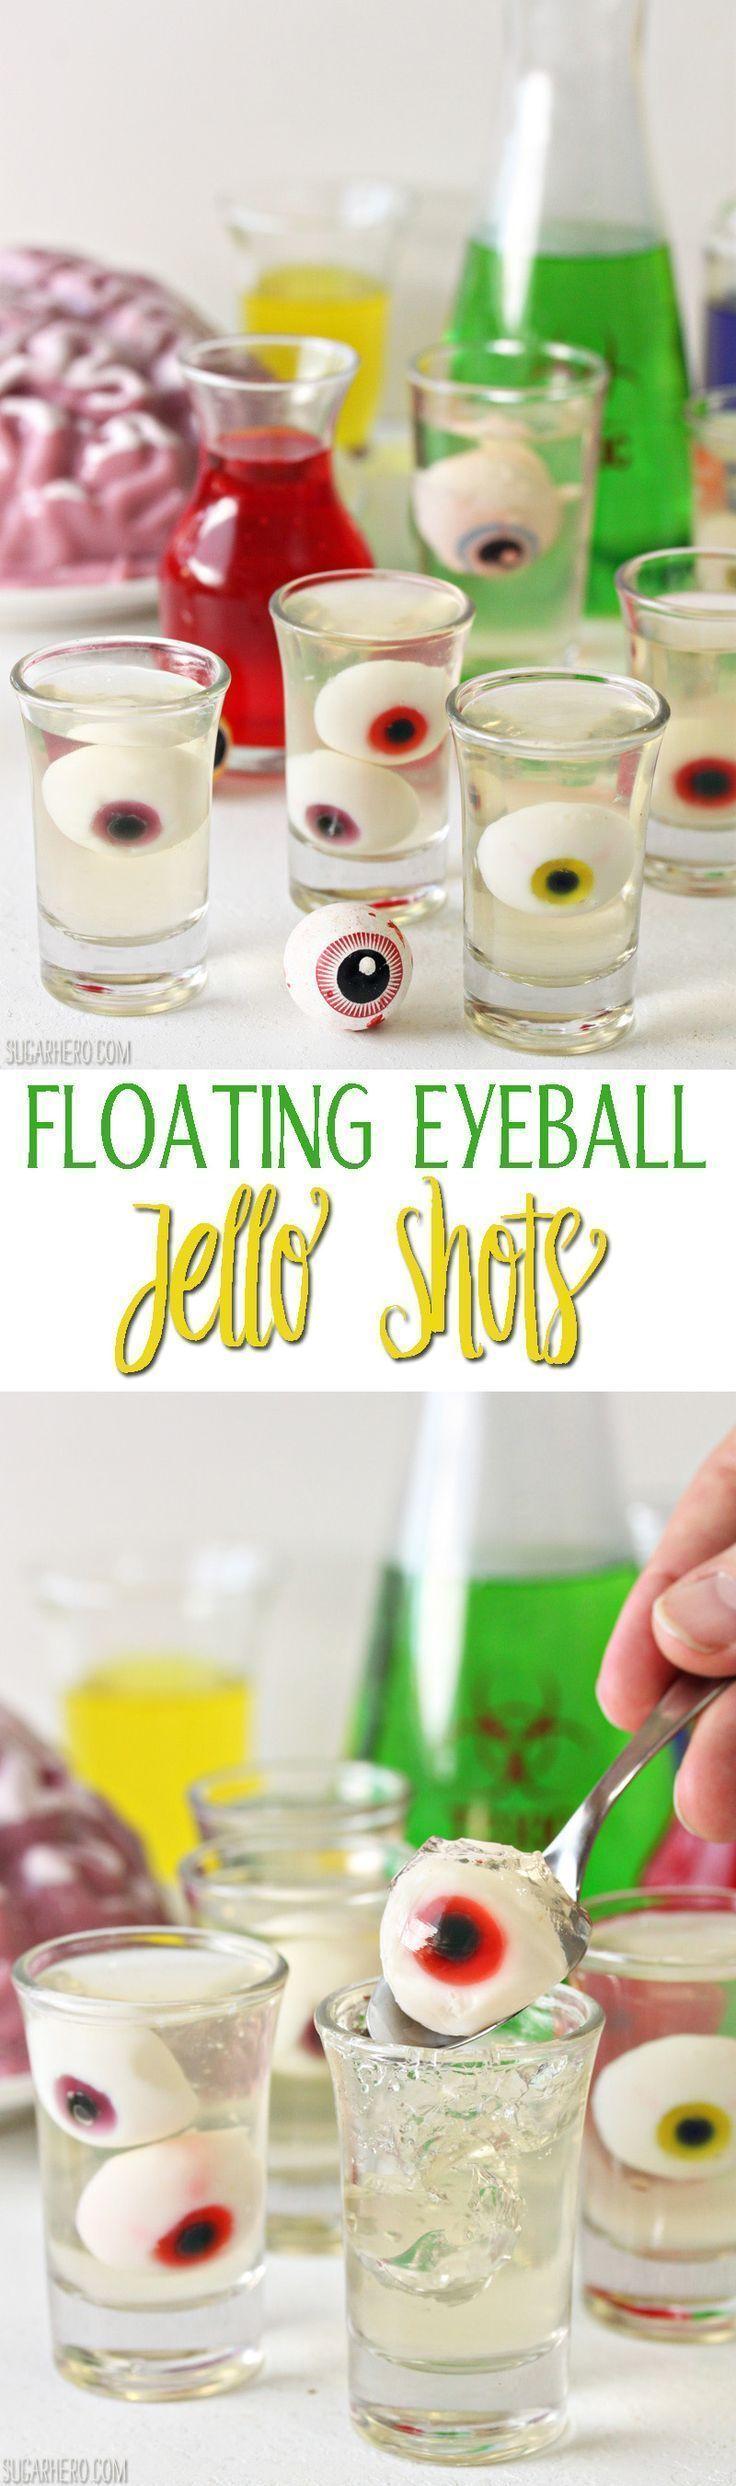 Floating Eyeball Jello Shots - so easy (and so creepy!) for - halloween party decoration ideas adults